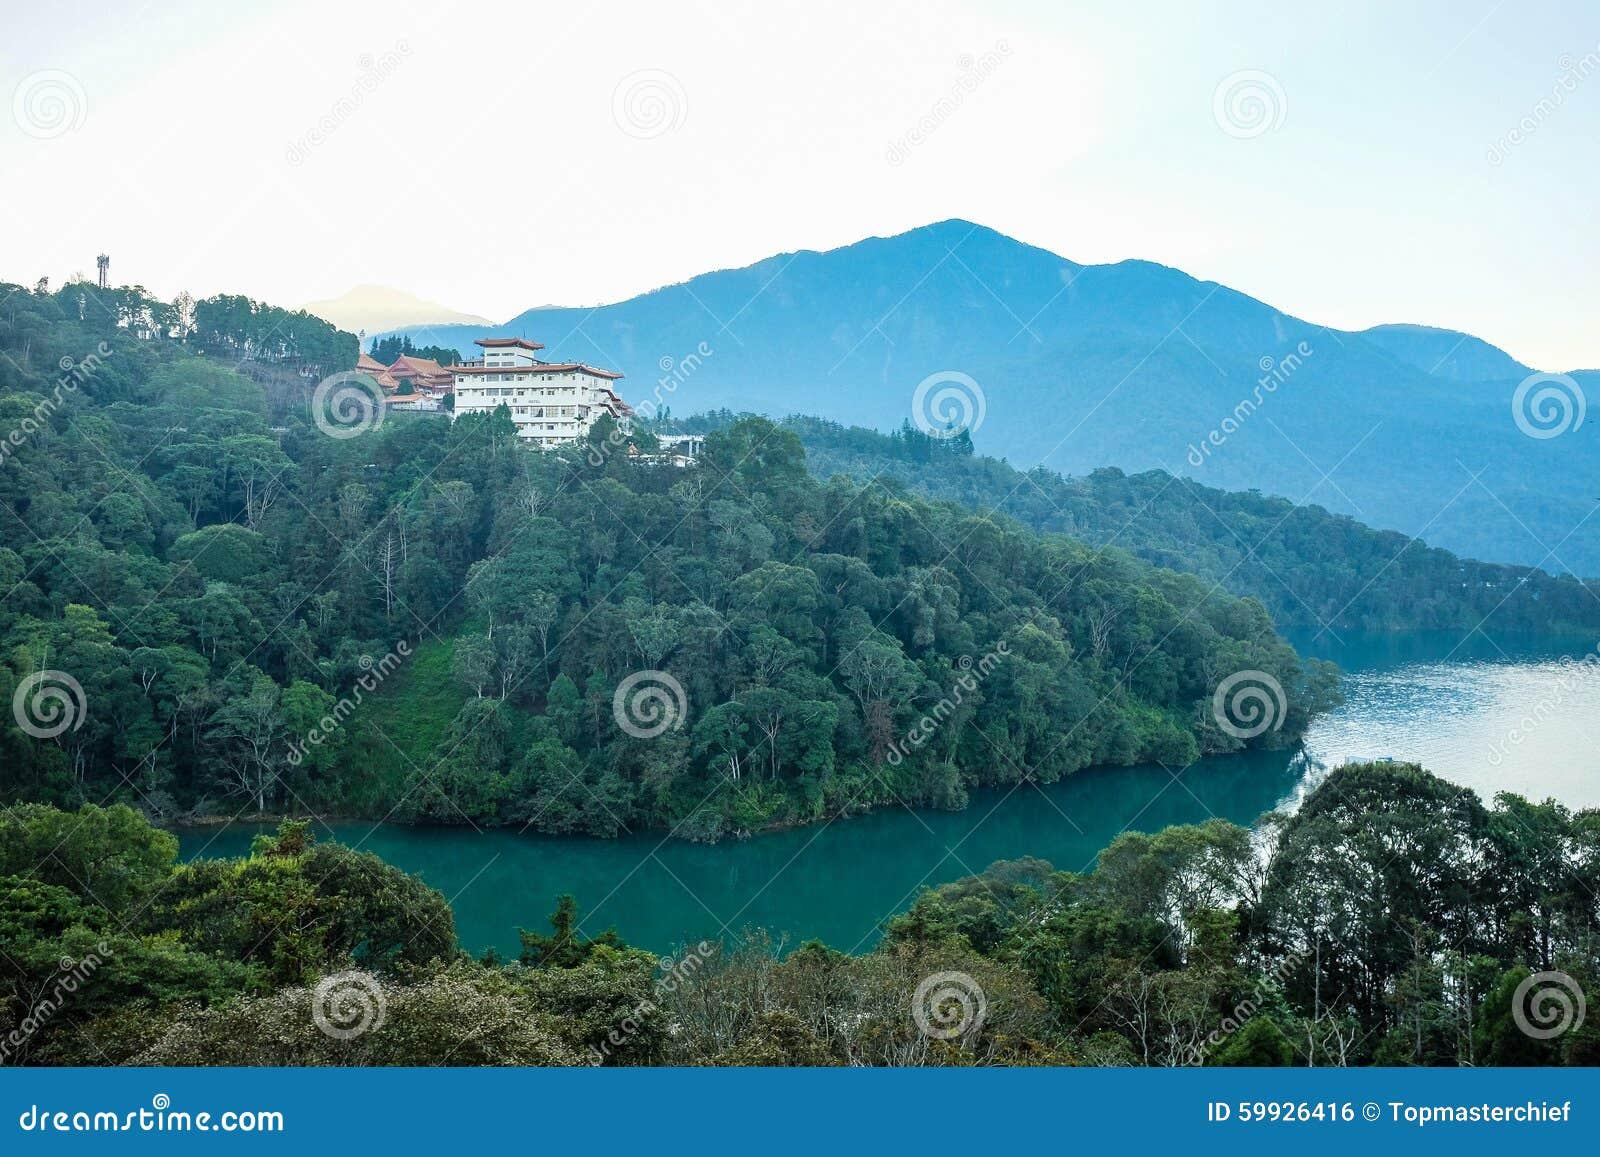 Spa home sun moon lake luxury lakeside hotel yuchi township